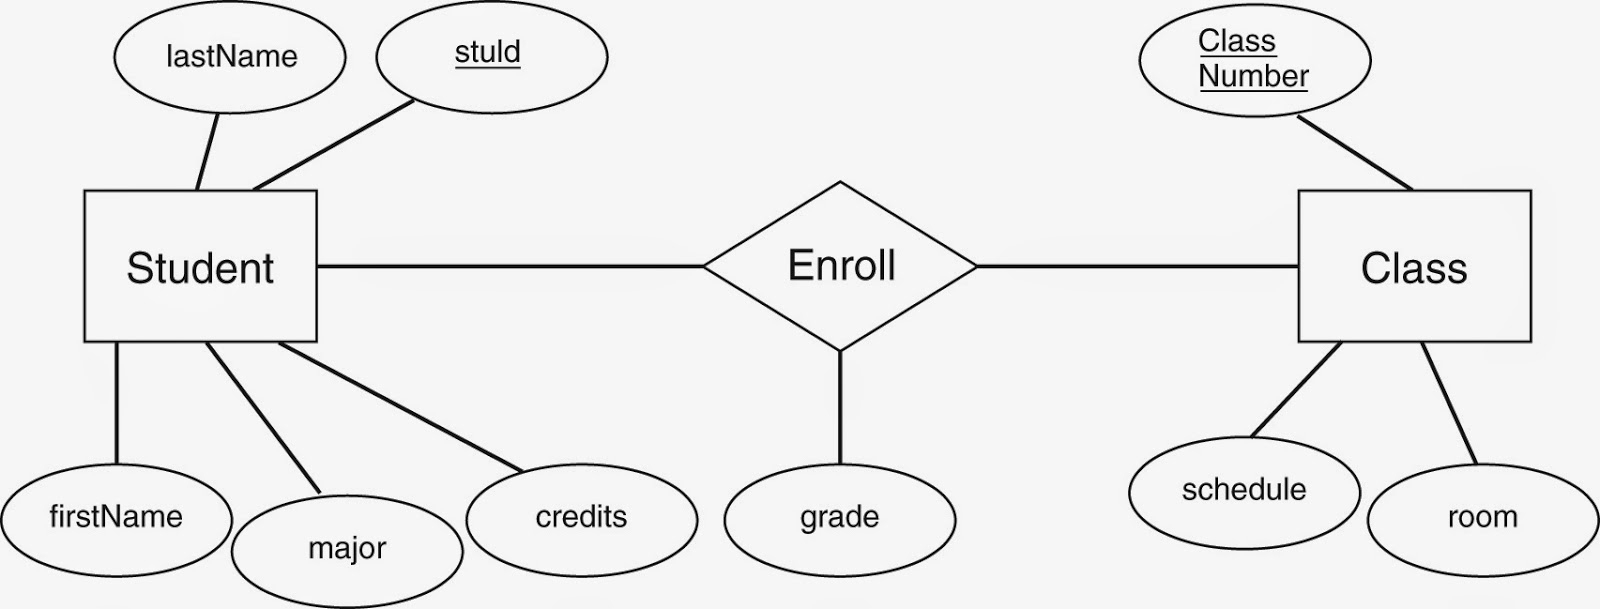 Relational Database Management System (Rdbms): Examples Of Er Diagram with regard to Er Diagram Examples Rdbms